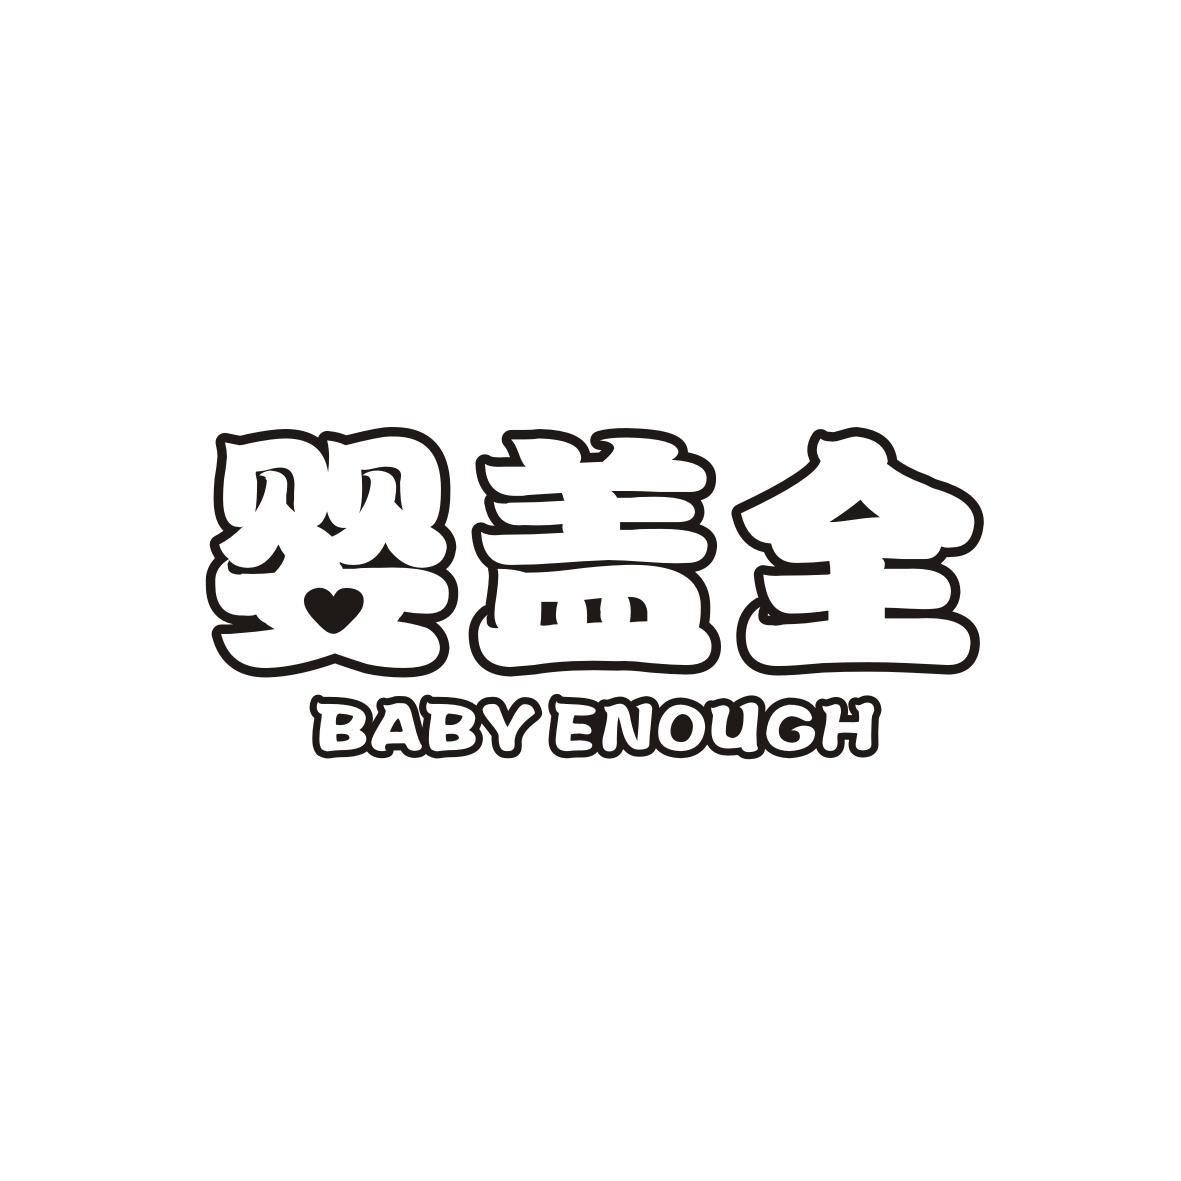 婴盖全 BABY ENOUGH